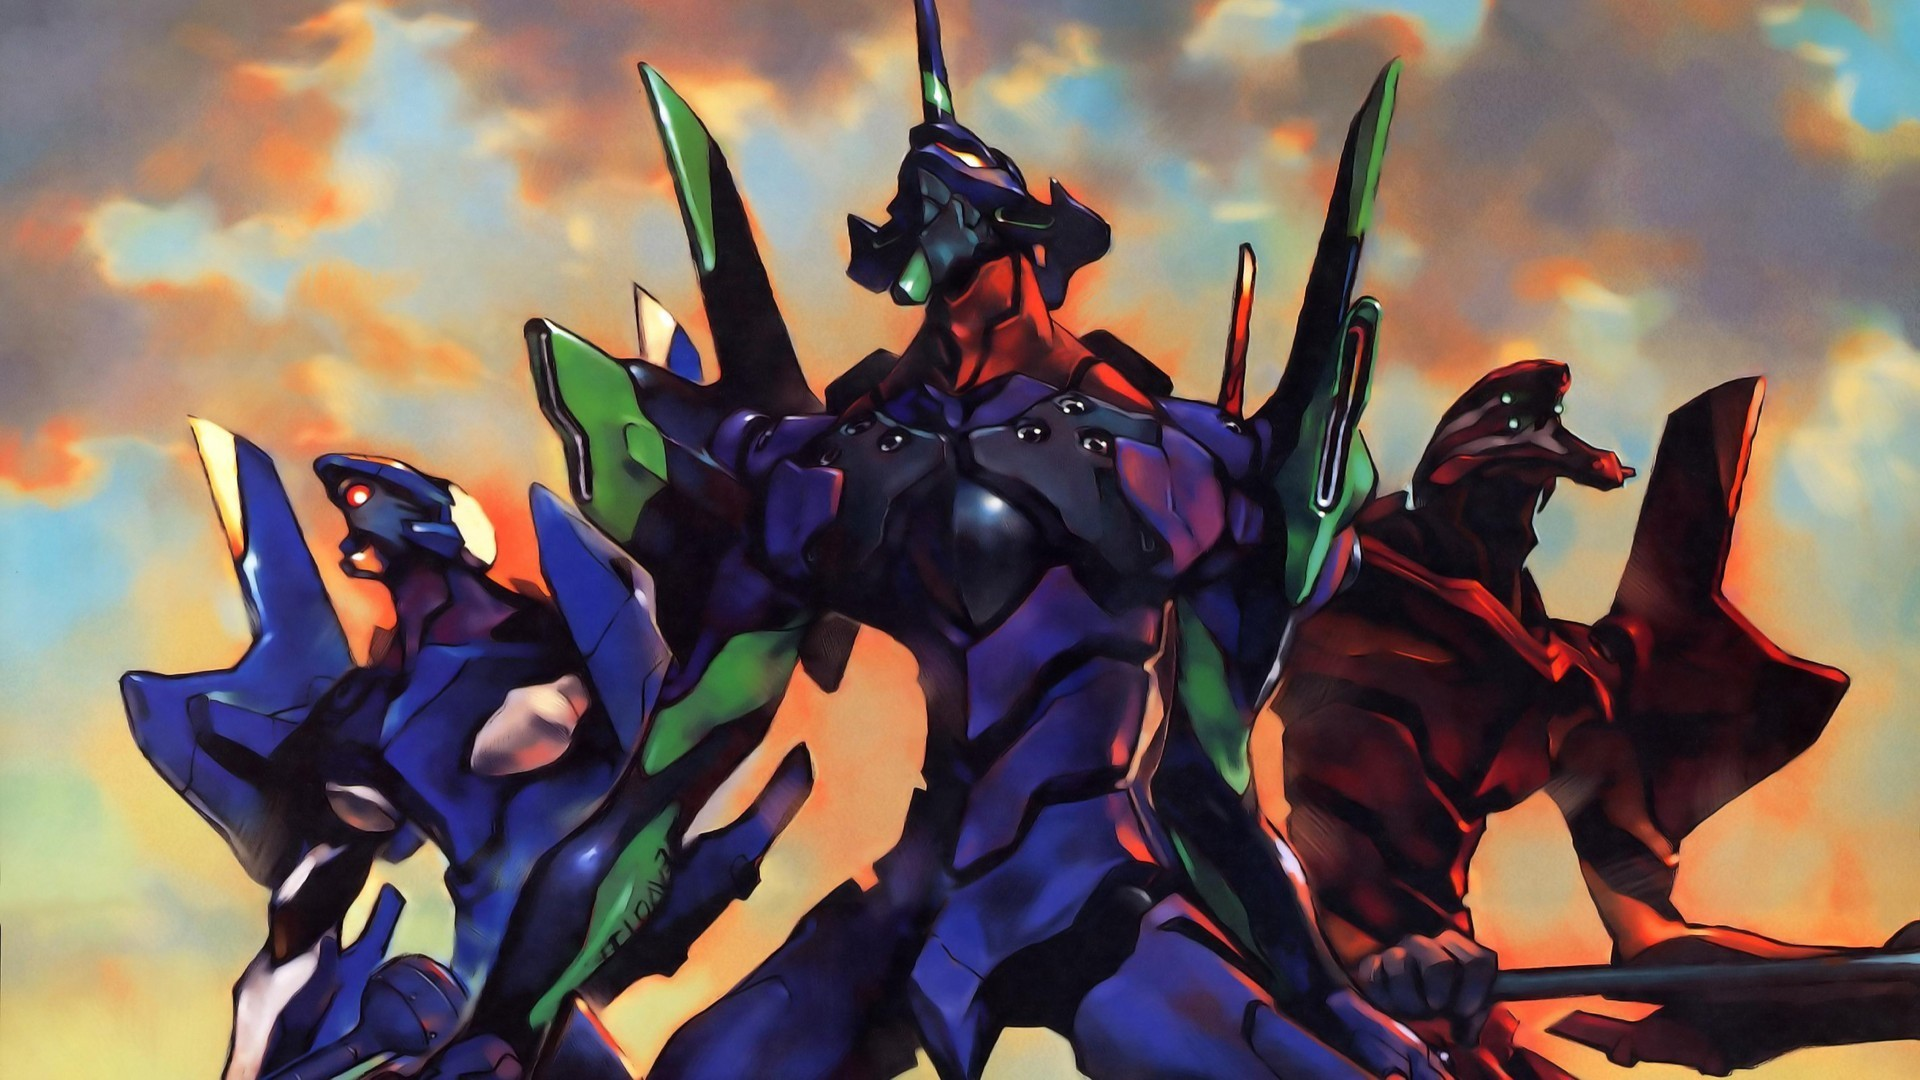 evangelion-unit-01-neon-genesis-evangelion-anime-hd-